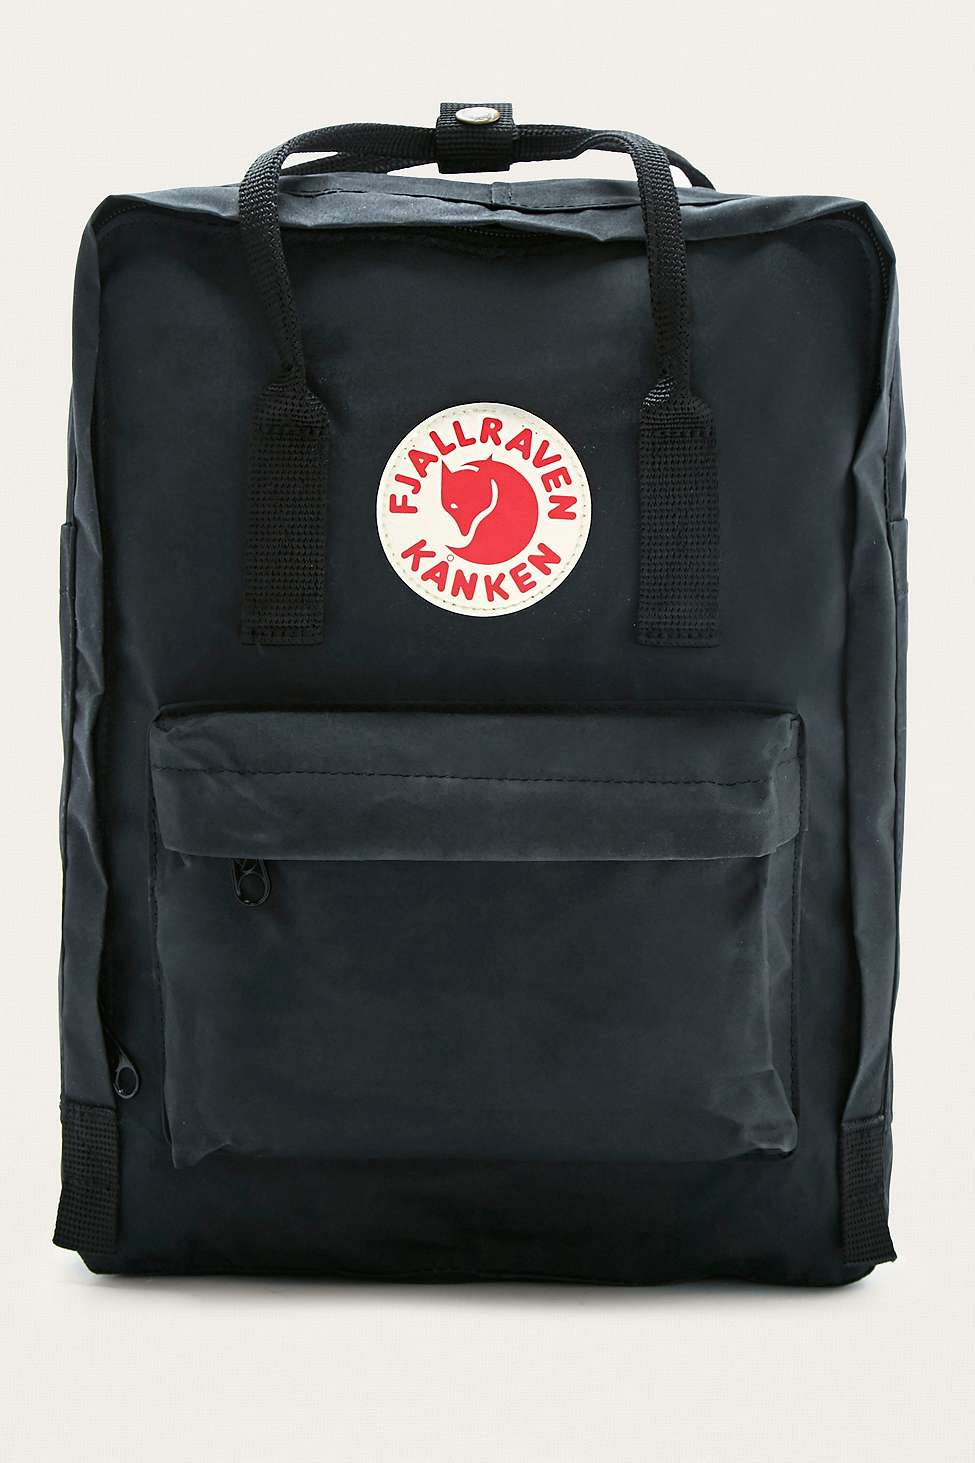 Fjallraven Kanken Classic Black Backpack   Urban Outfitters